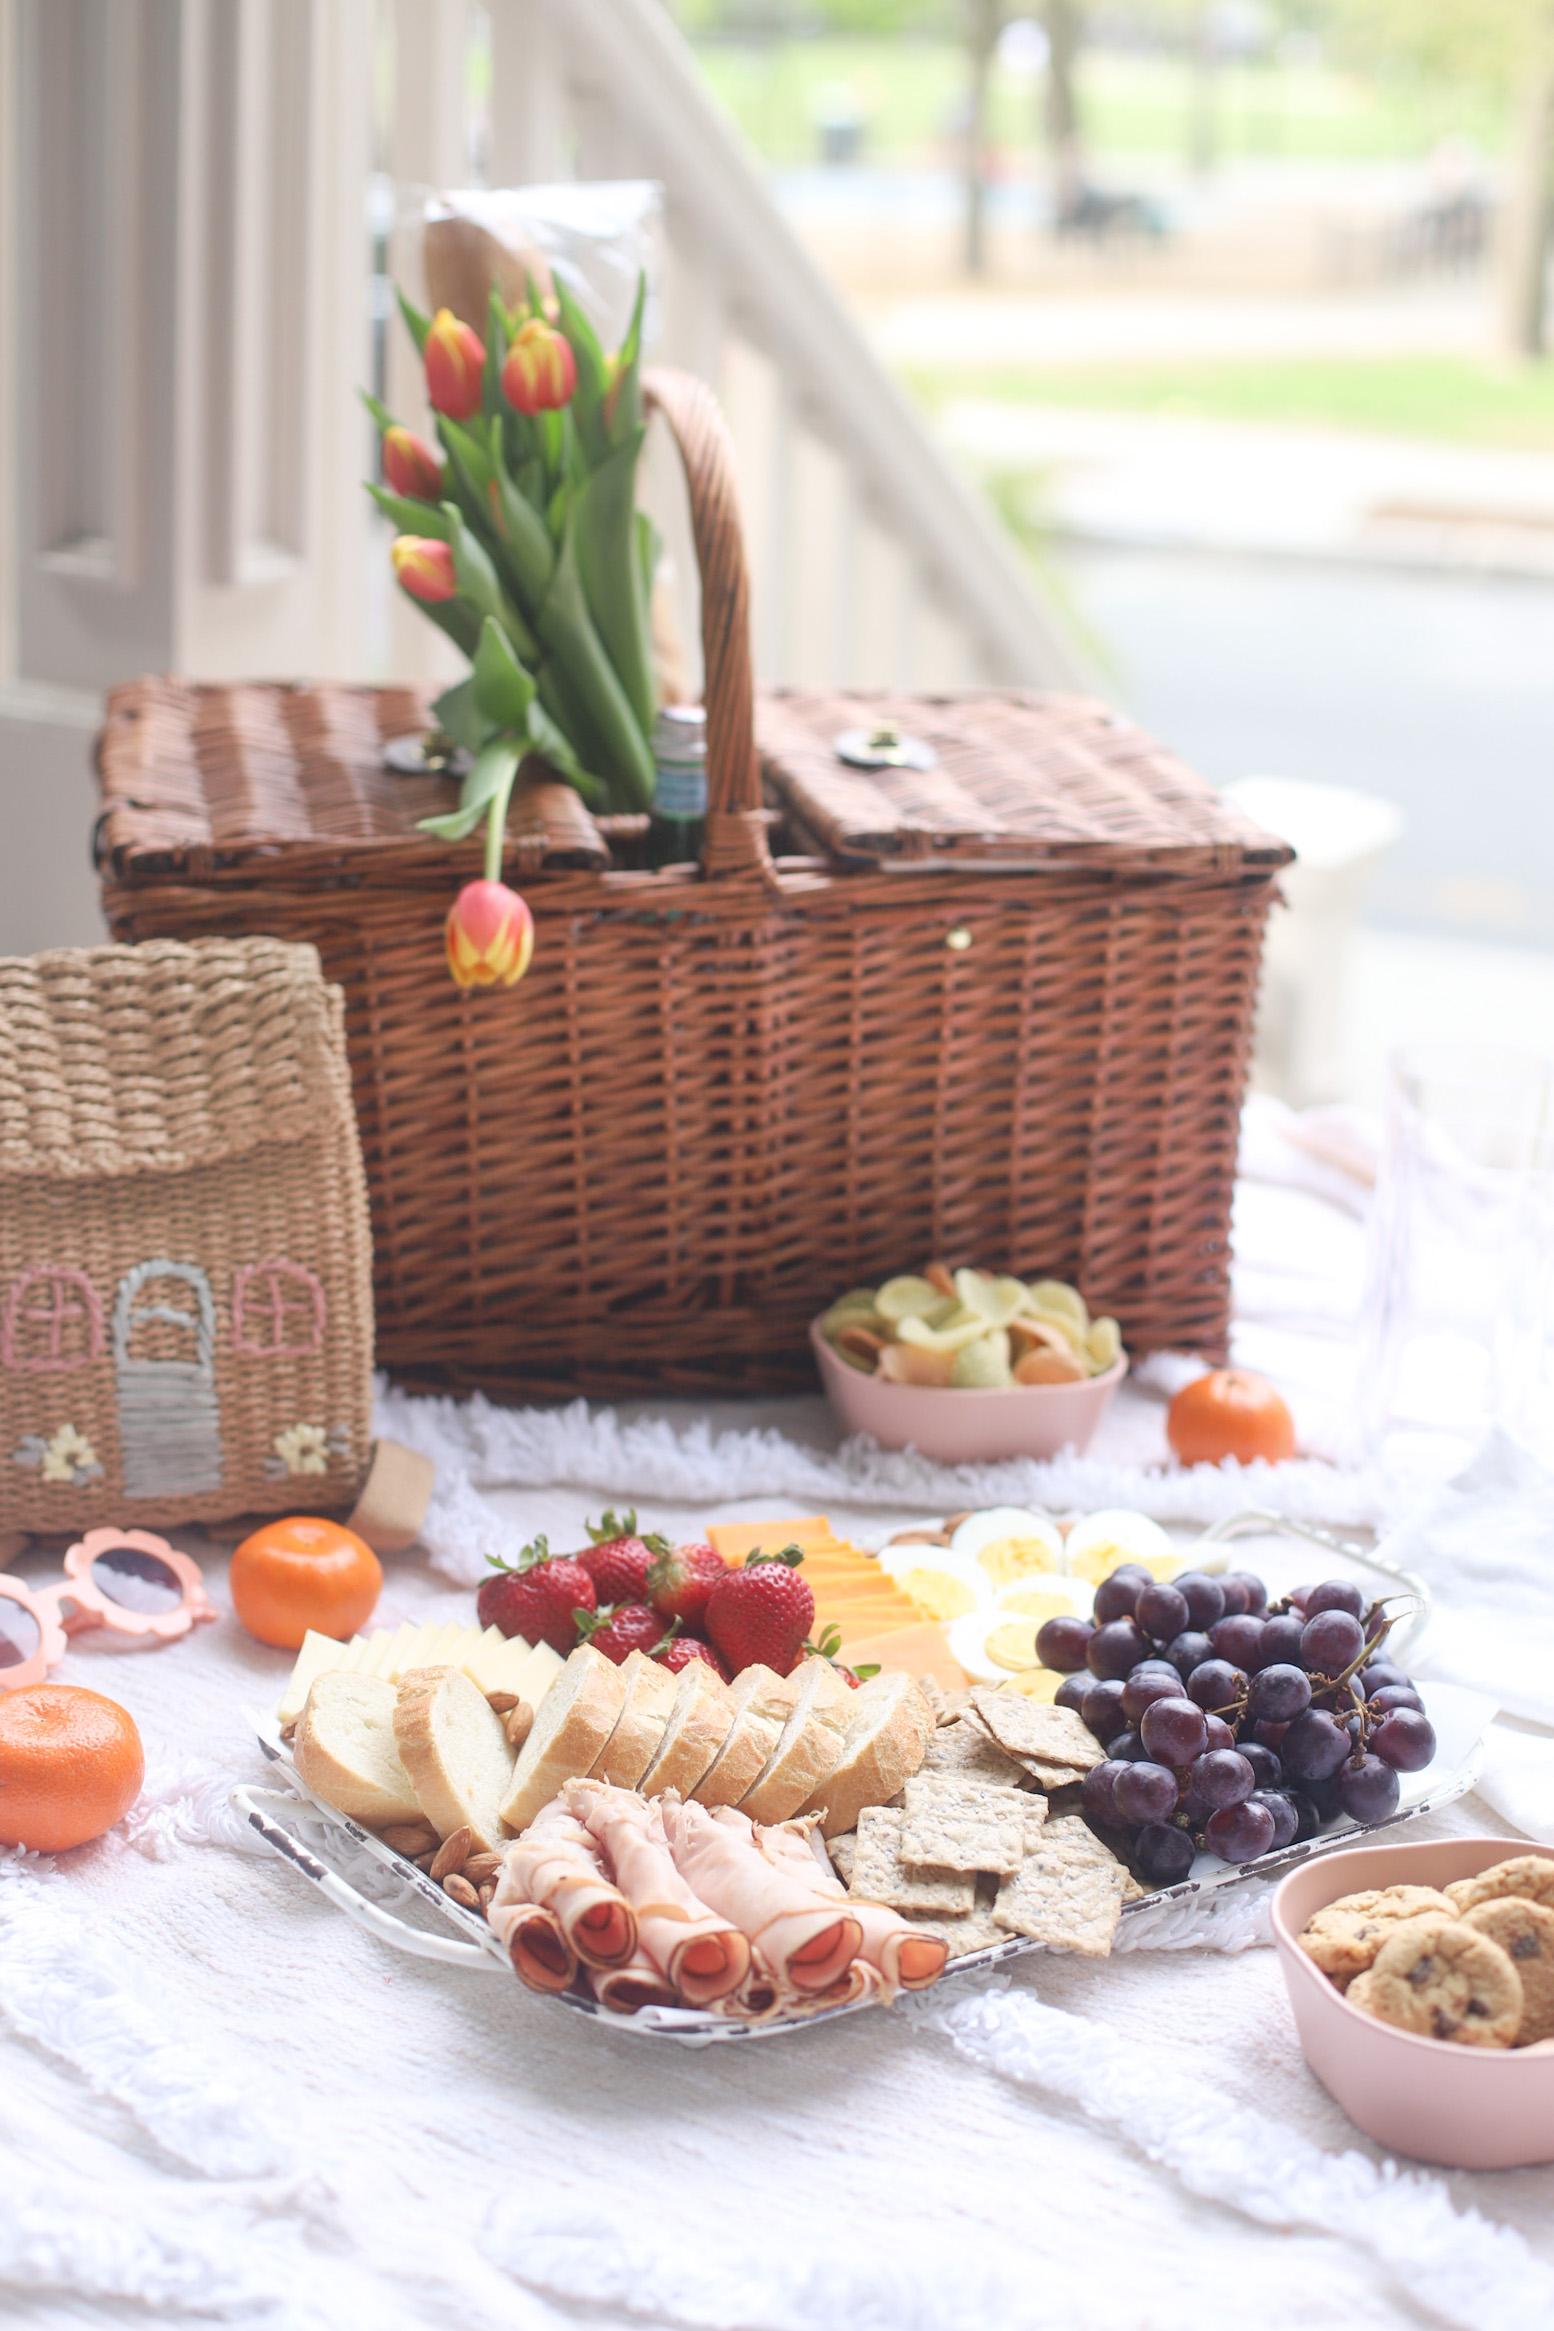 A Simple Porch Picnic and Snack Charcuterie Board